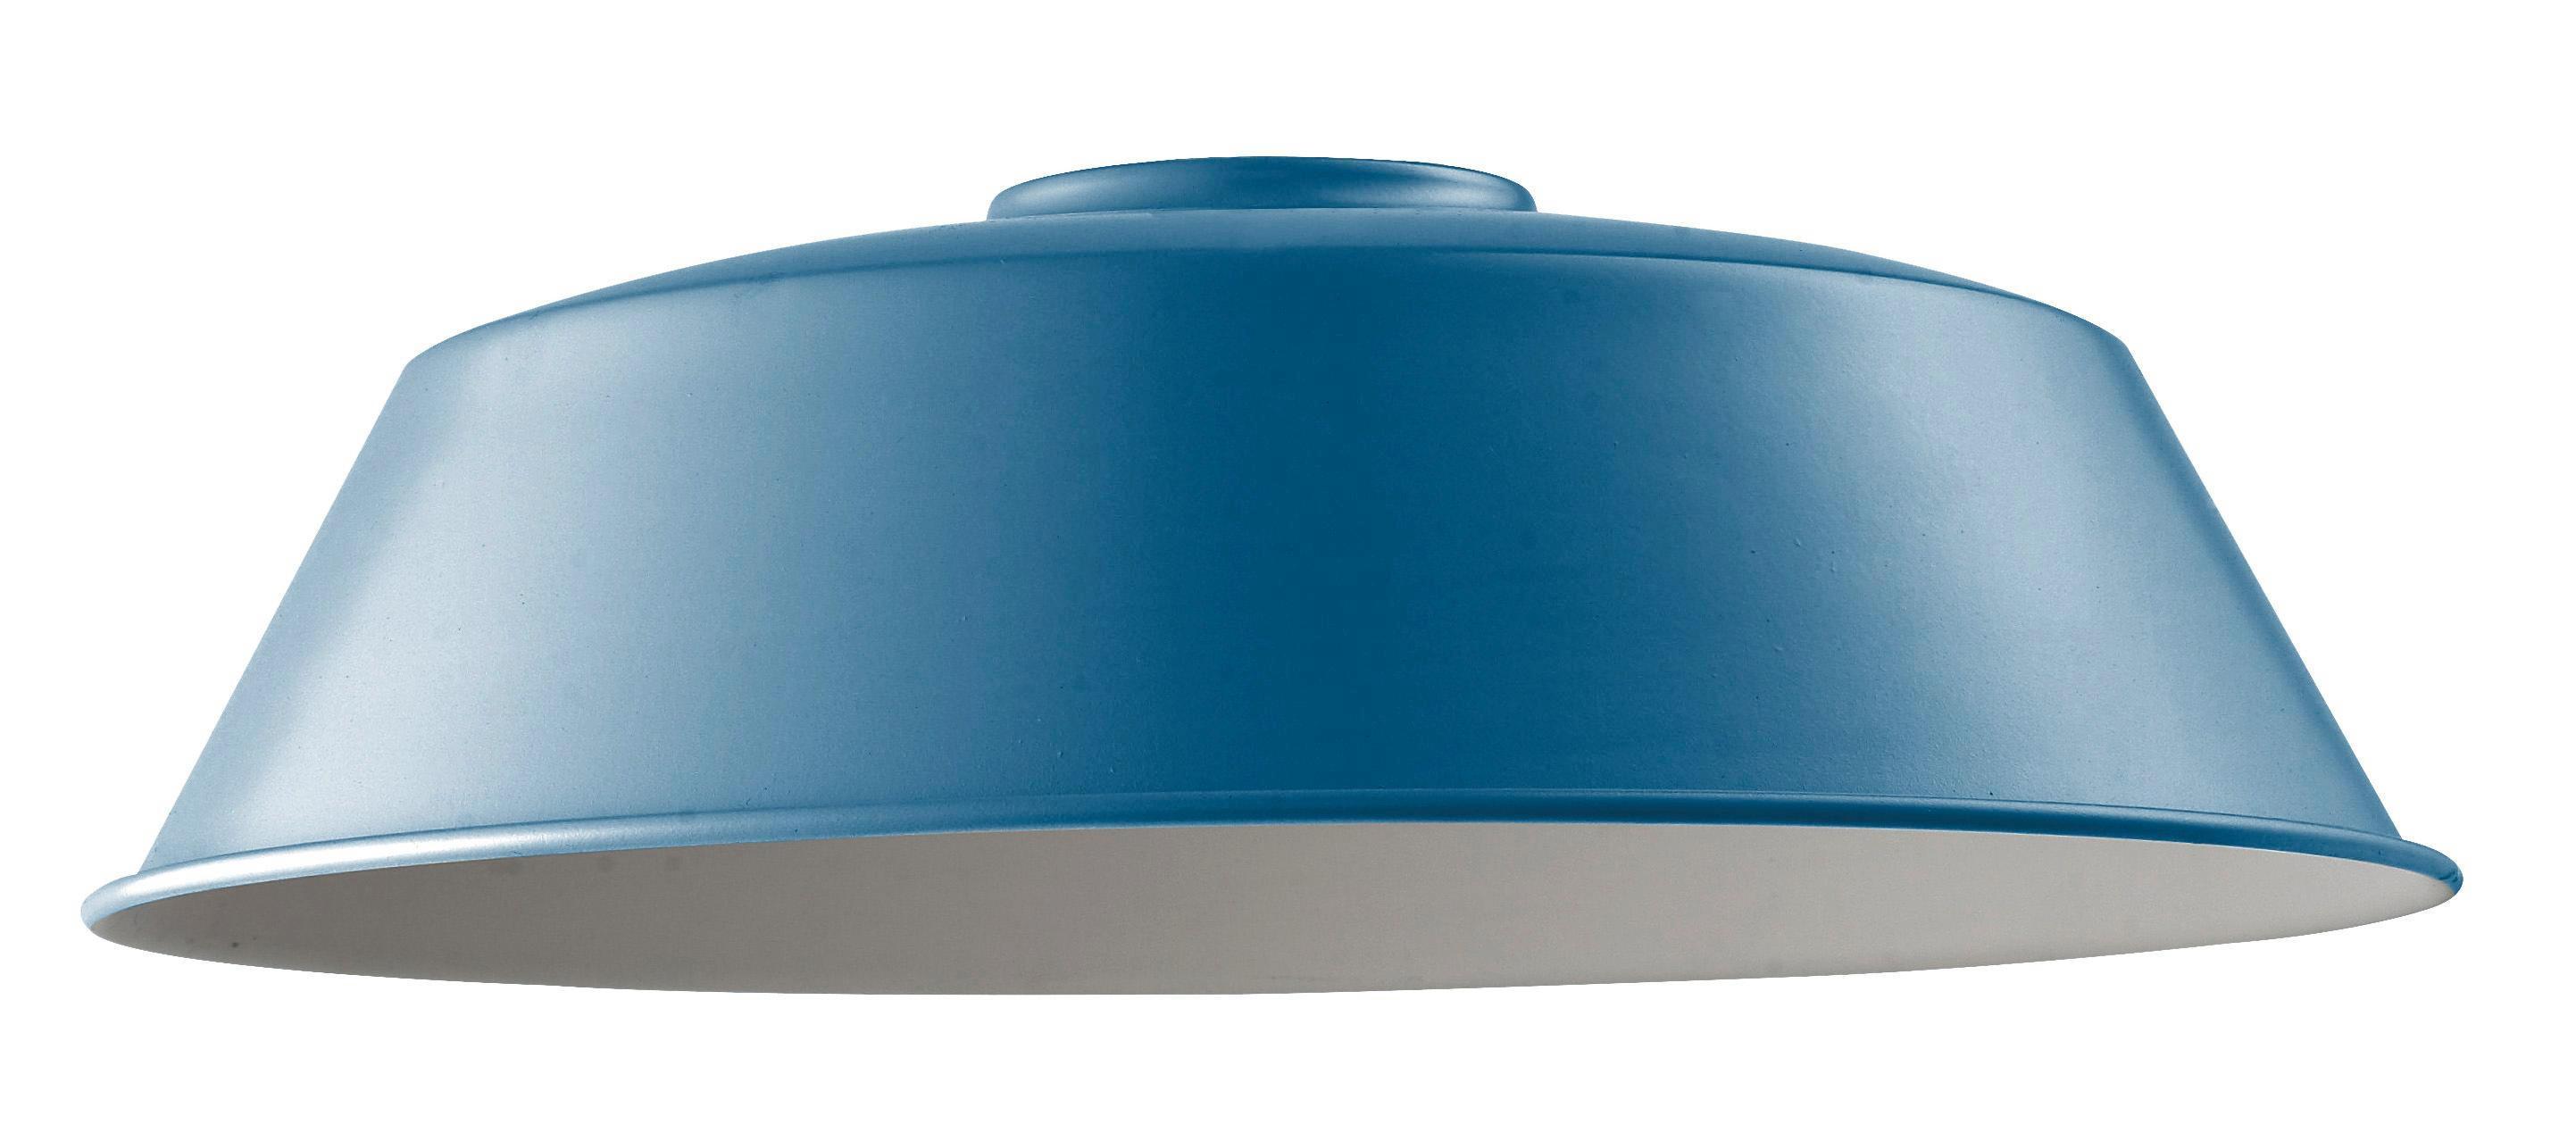 Leuchtenschirm Felix in Blau - Blau, Metall (36/36/18cm) - MÖMAX modern living